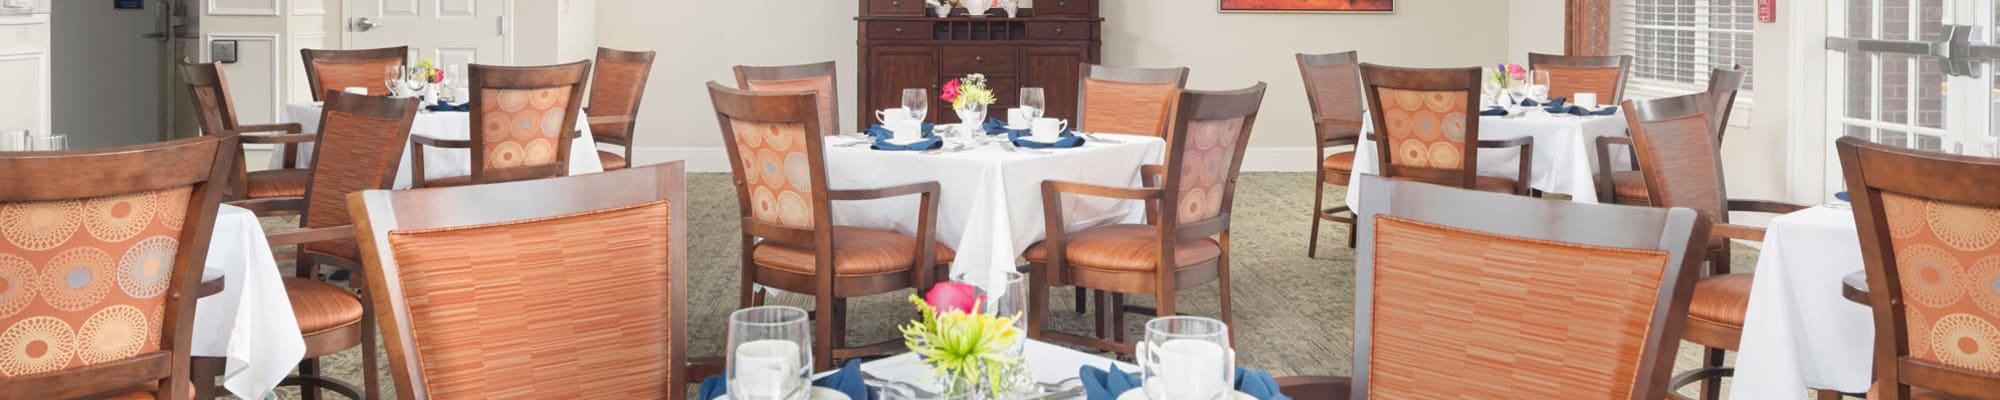 Dining at Harmony at Chantilly in Herndon, Virginia